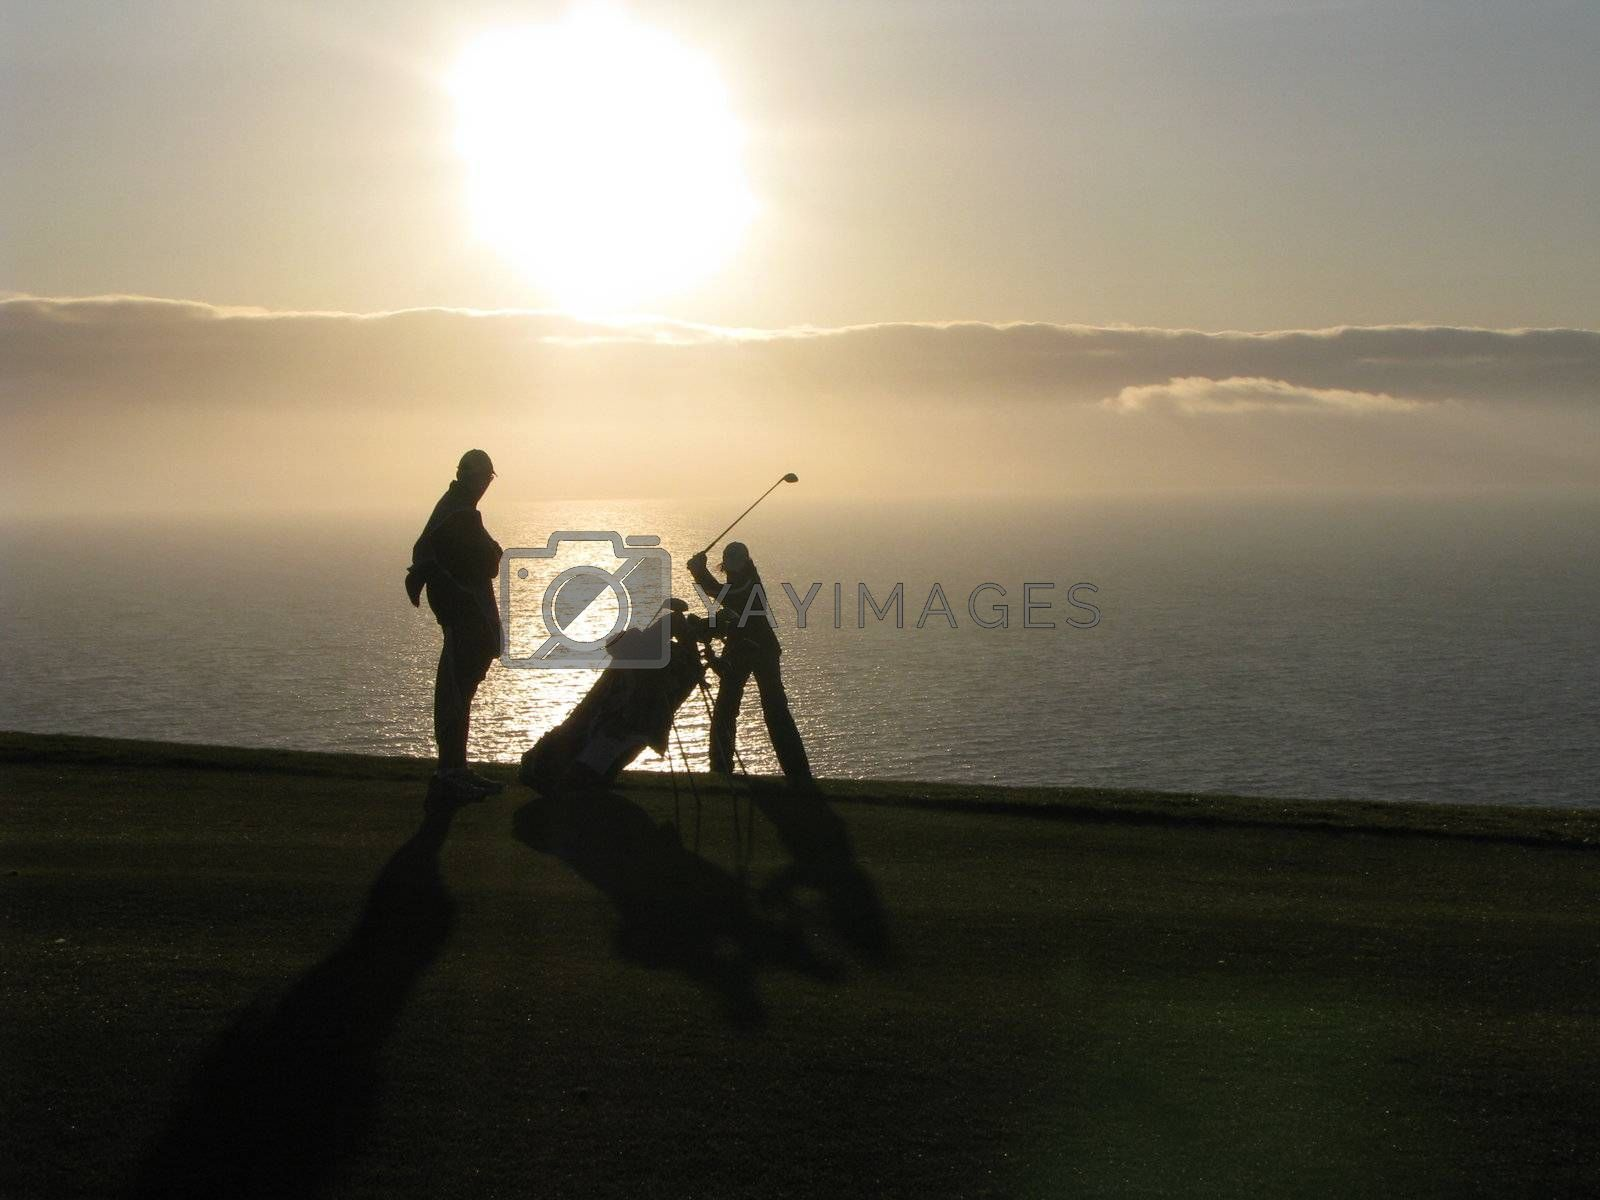 Golfer and her Caddy by ewilliamsdesign